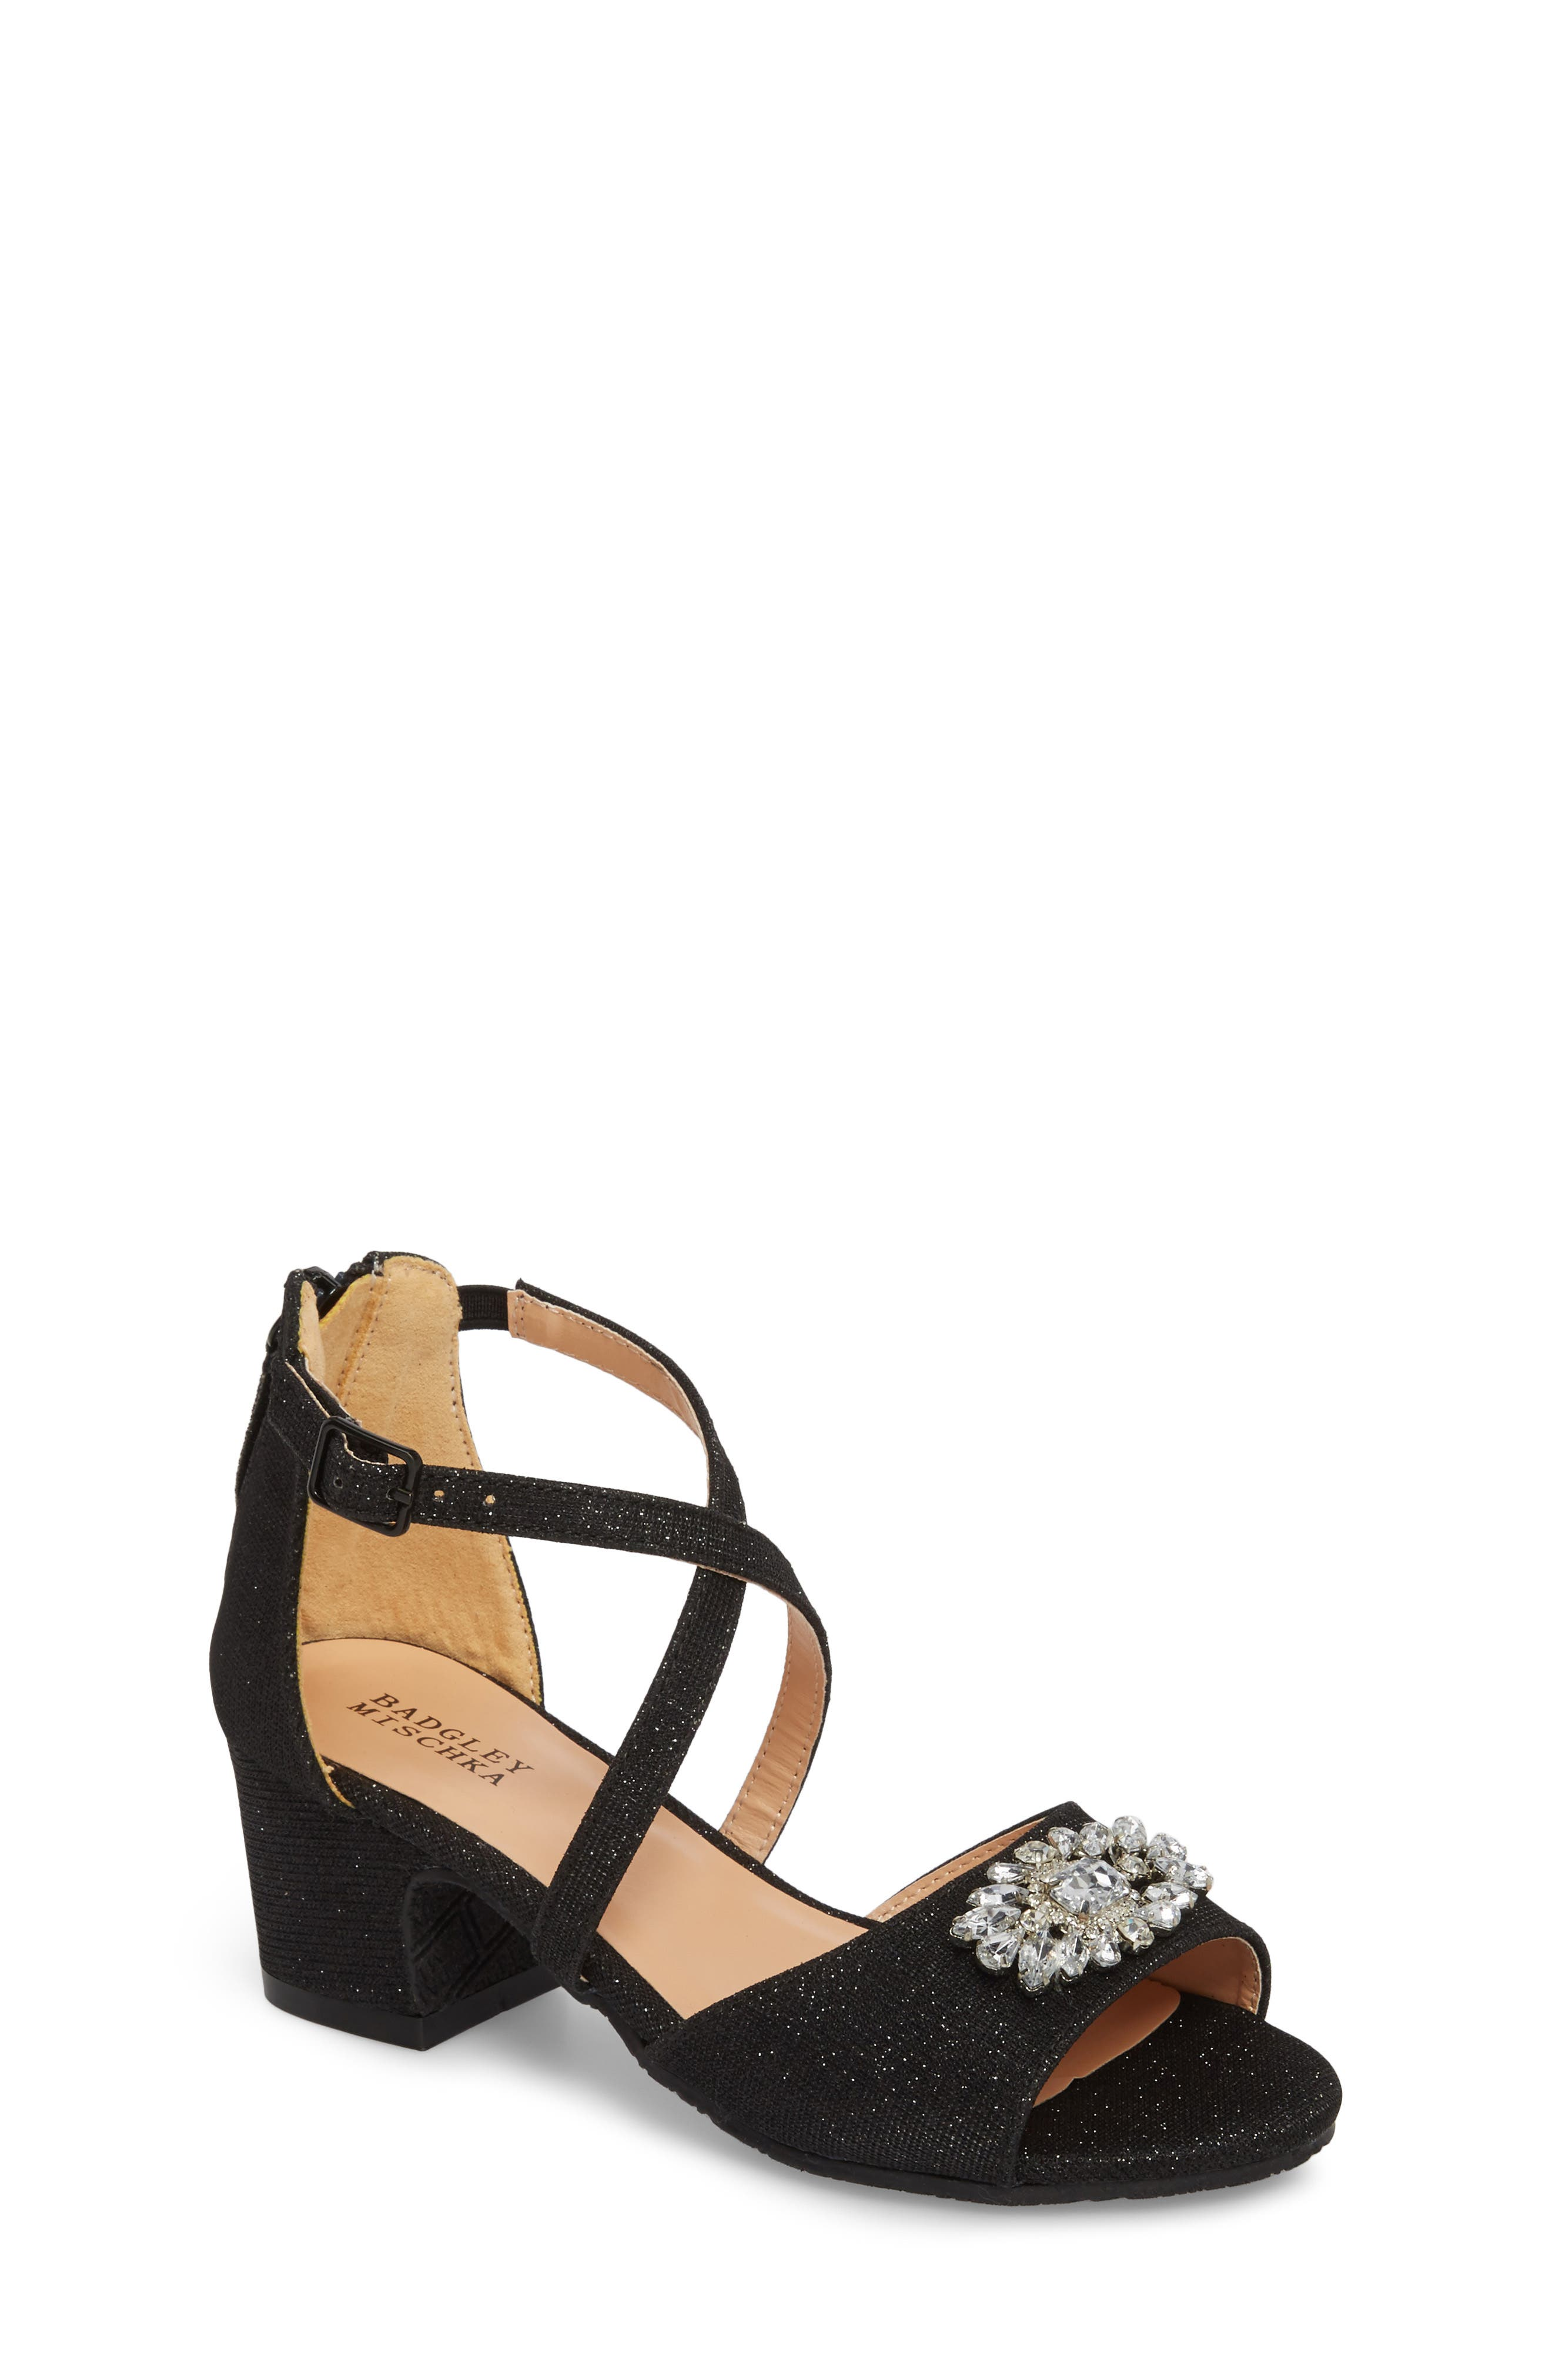 Pernia Gems Sandal,                             Main thumbnail 1, color,                             BLACK